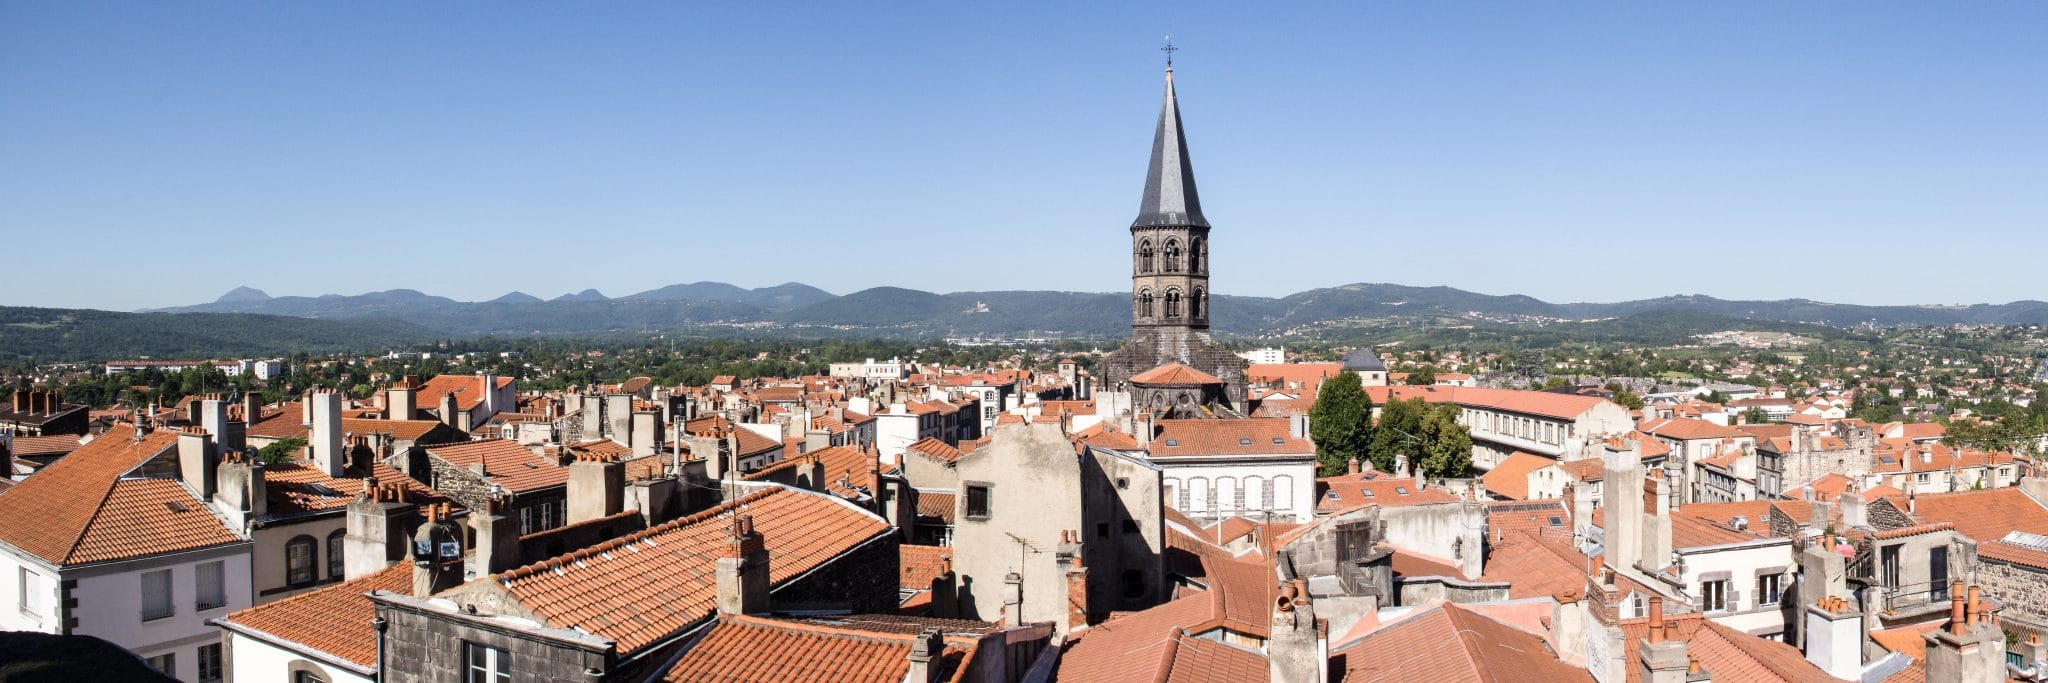 Nouvelle agence illiCO travaux Clermont-Ferrand Nord – Riom !